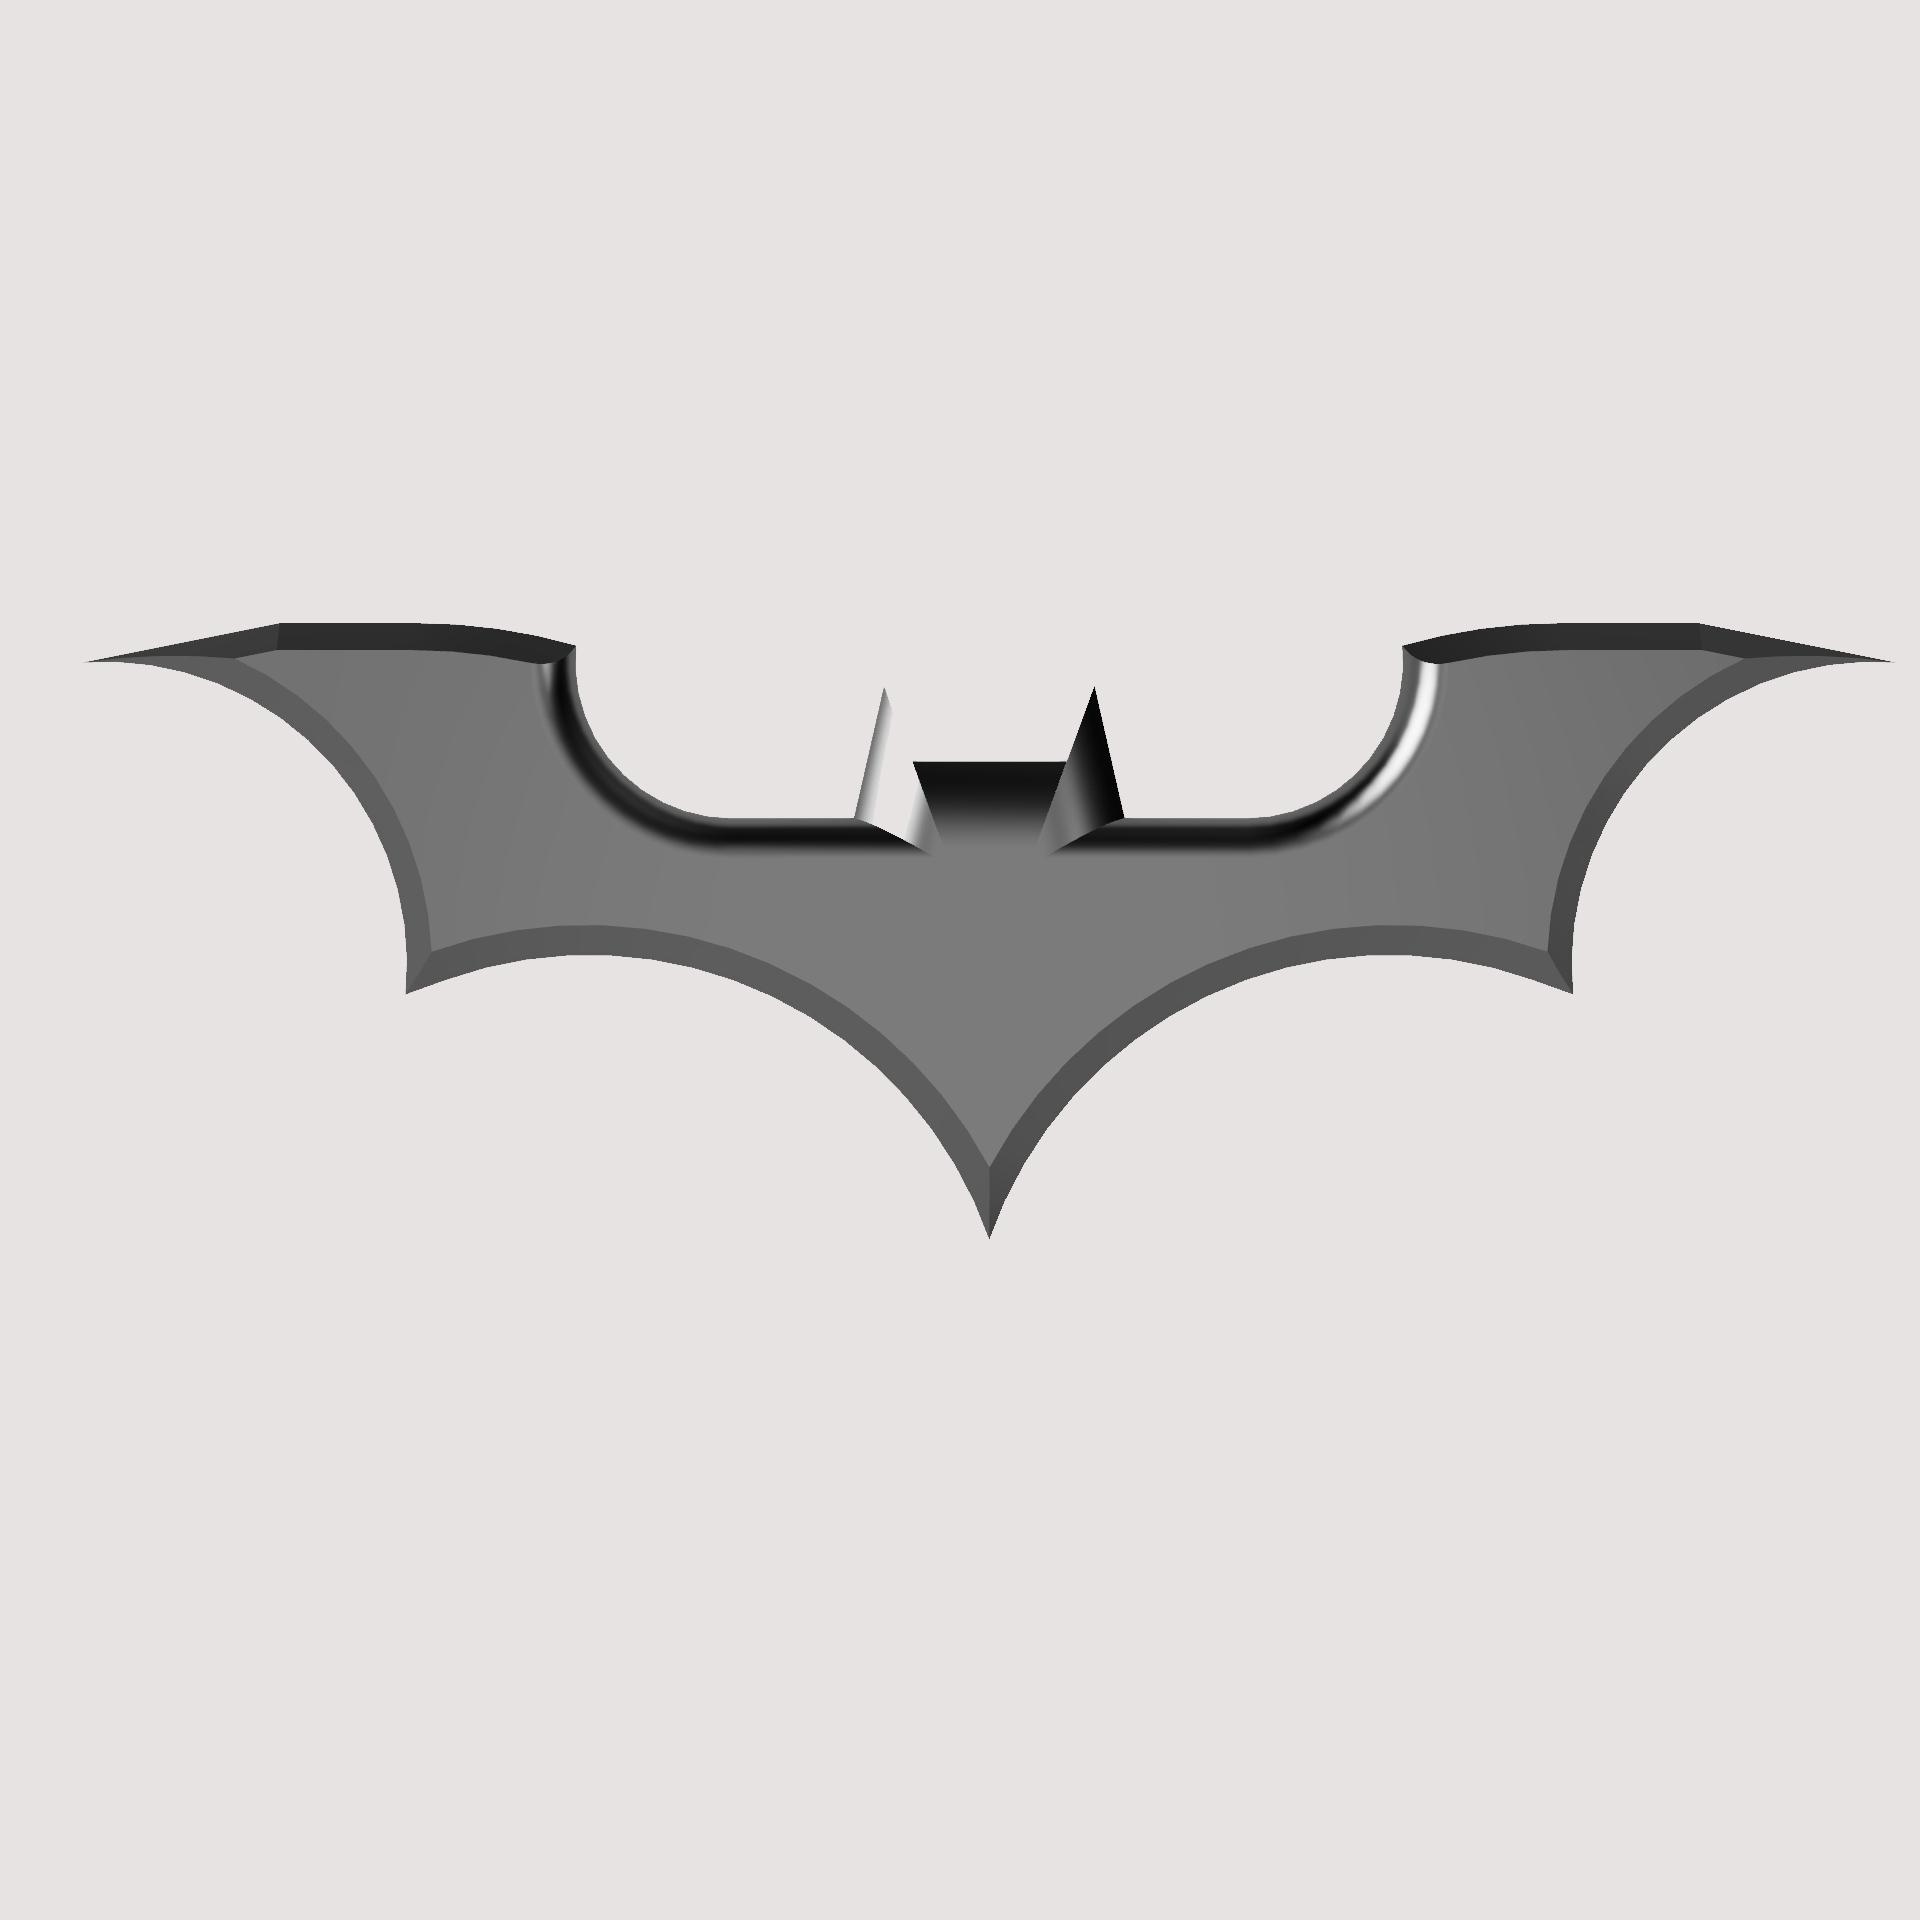 b1.jpg Download free STL file BATARANG v1.0 • Design to 3D print, jediSam